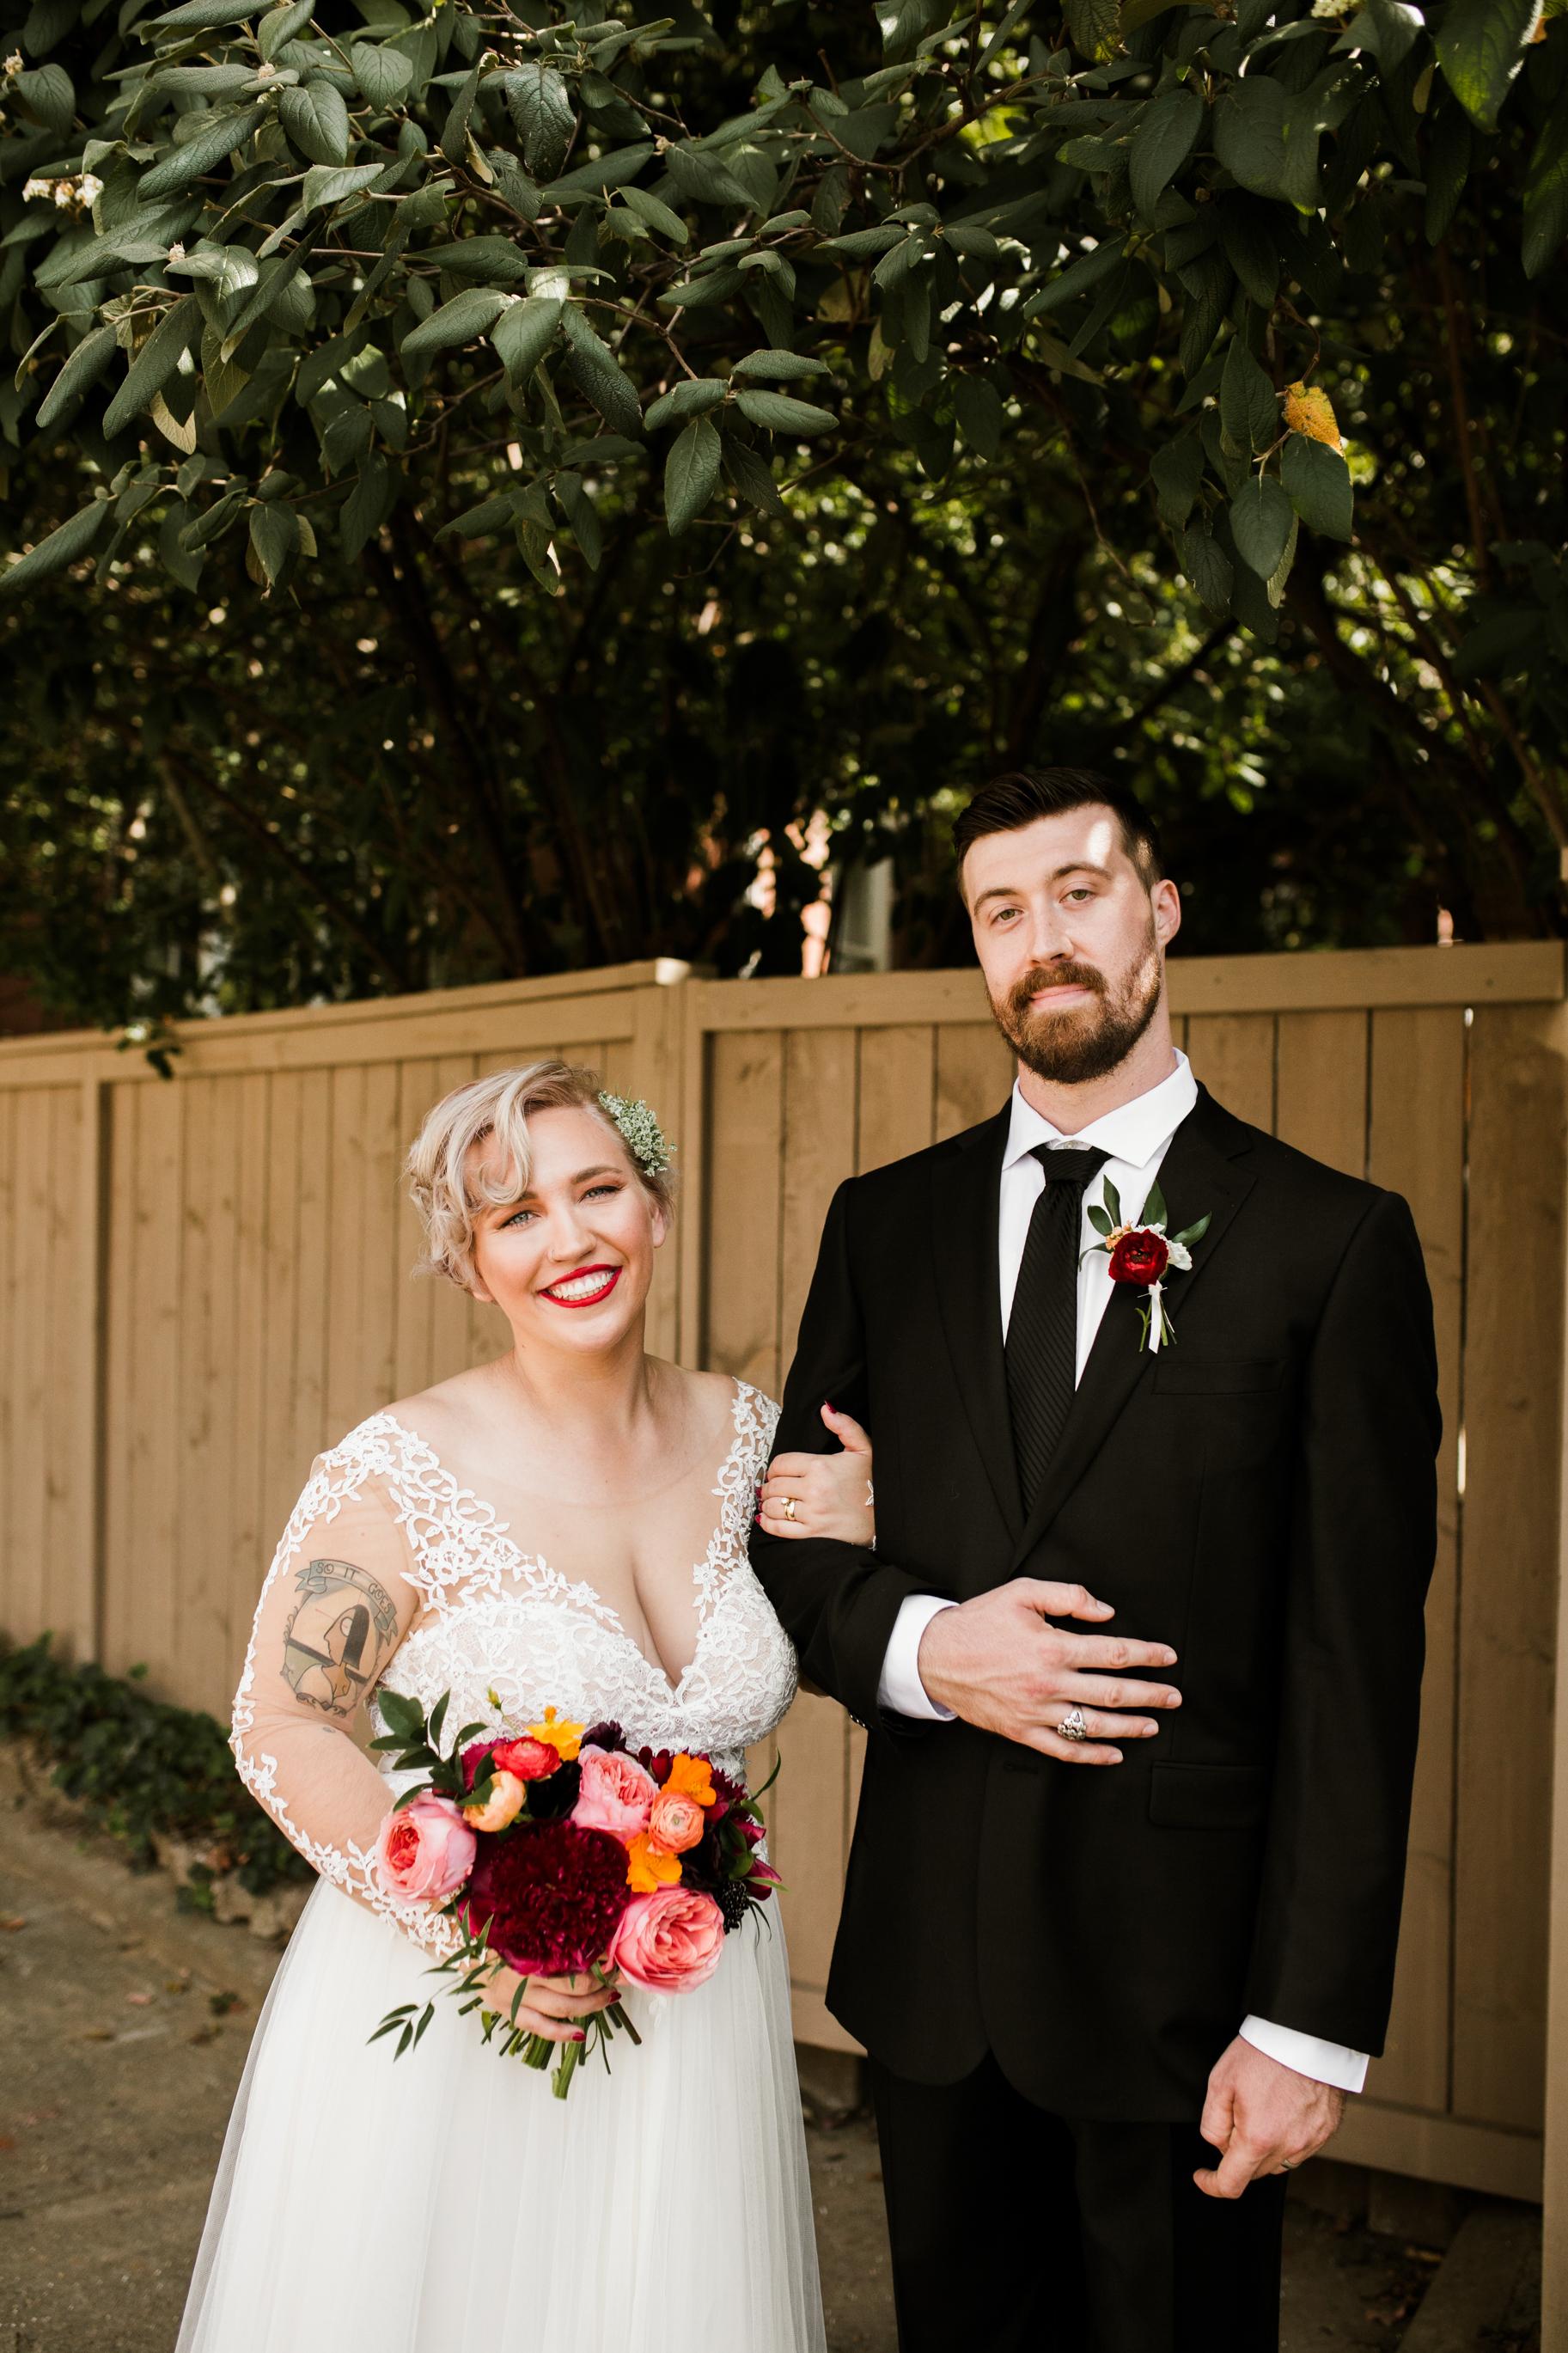 Kentucky Wedding Louisville Wedding Photographer 2018 Crystal Ludwick Photo Louisville Wedding Photographer Kentucky Wedding Photographer (103 of 105).jpg